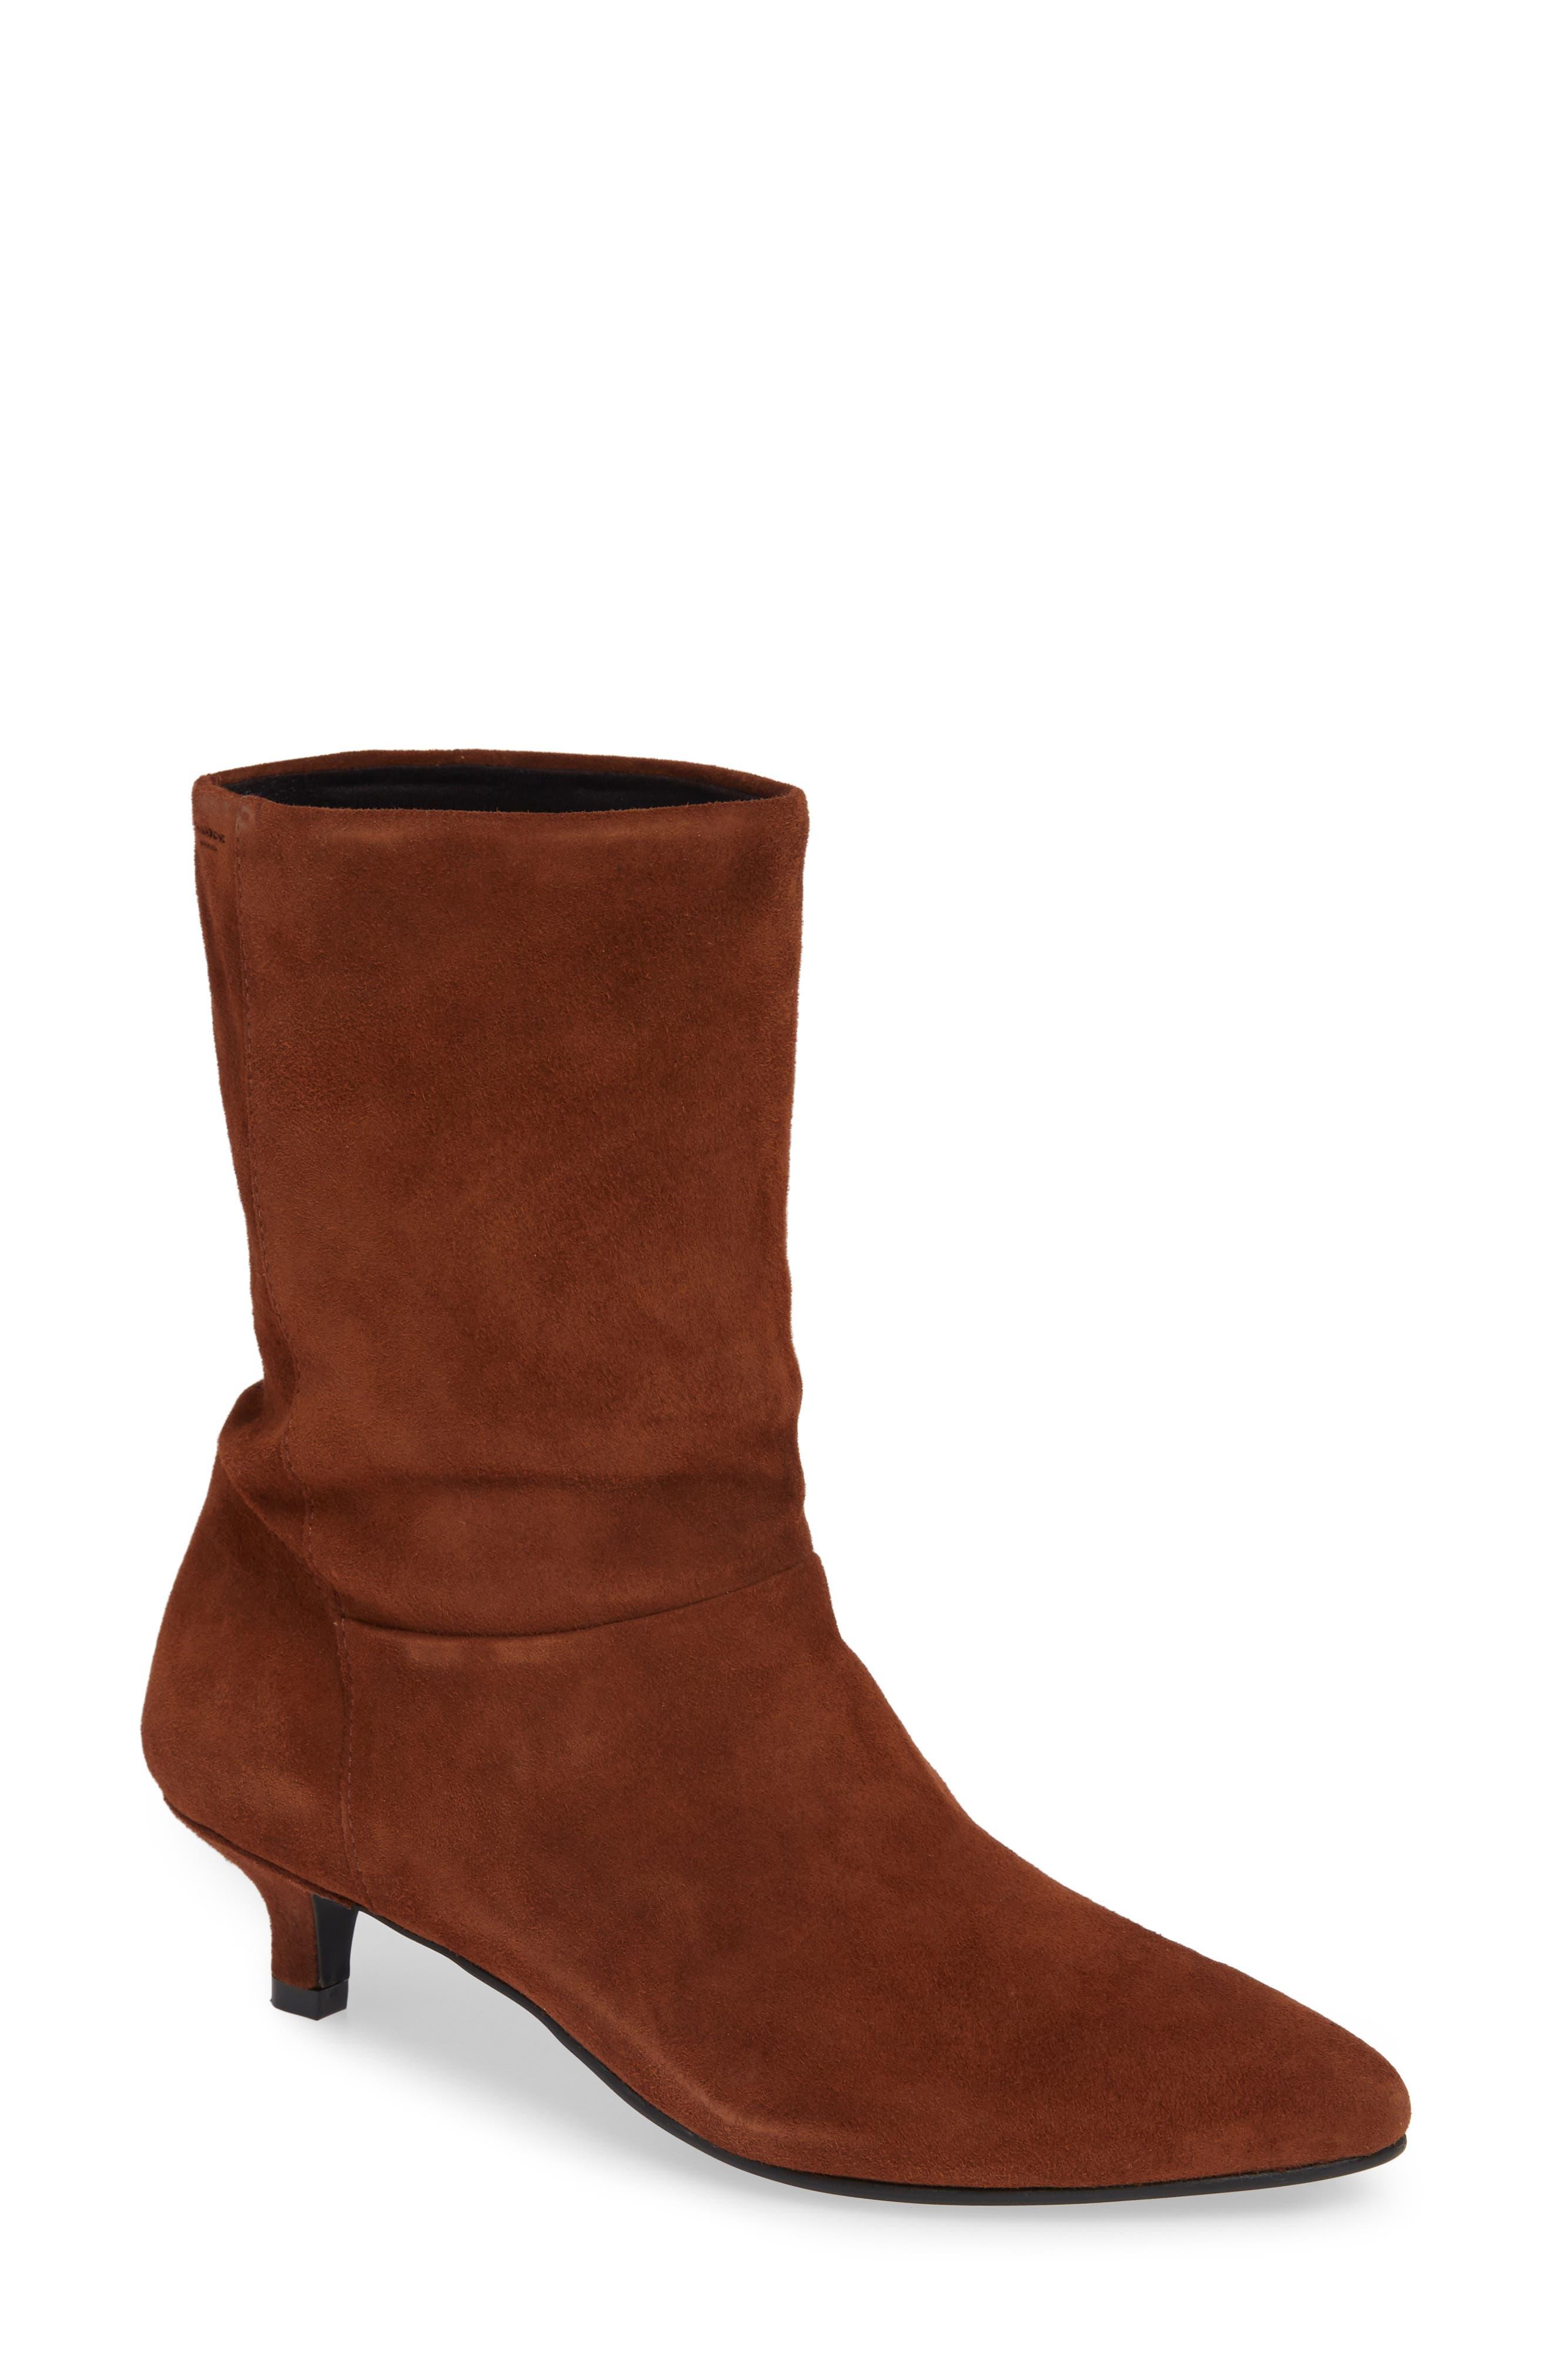 Vagabond Shoemakers Minna Slouch Bootie